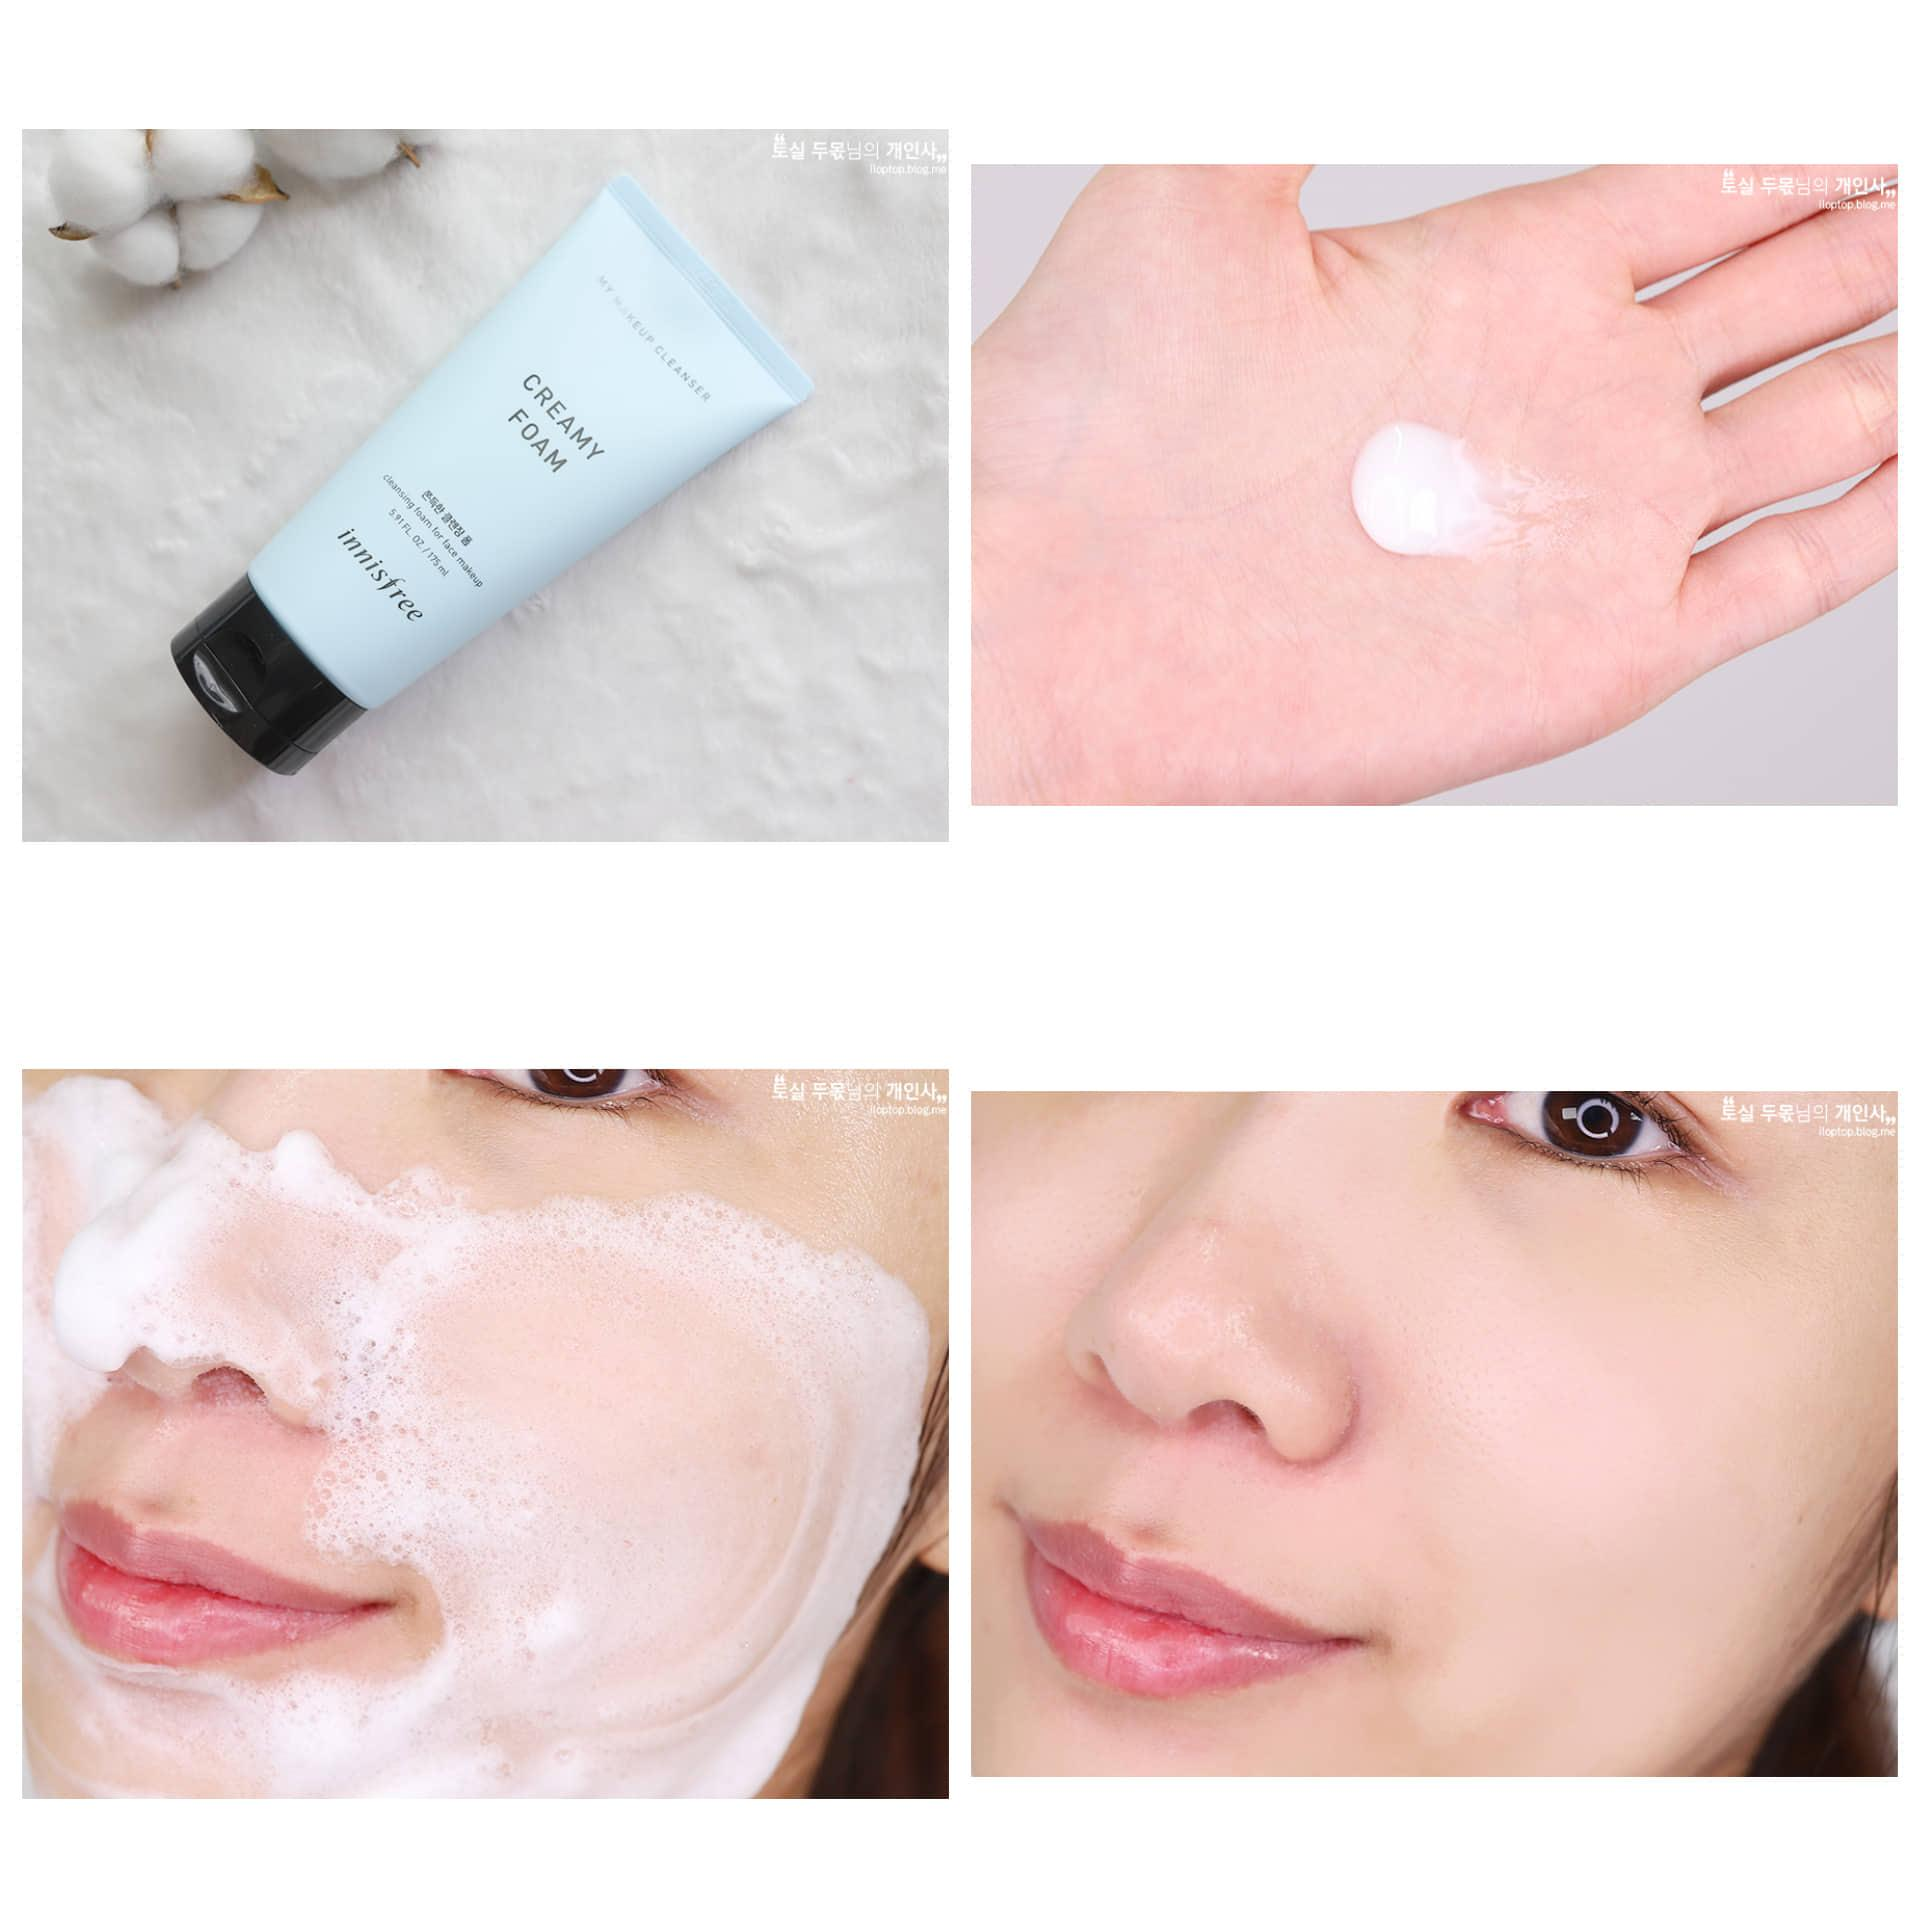 Sữa Rửa Mặt Tẩy Trang Innisfree My Make Up Cleanser Creamy Foam 175ml